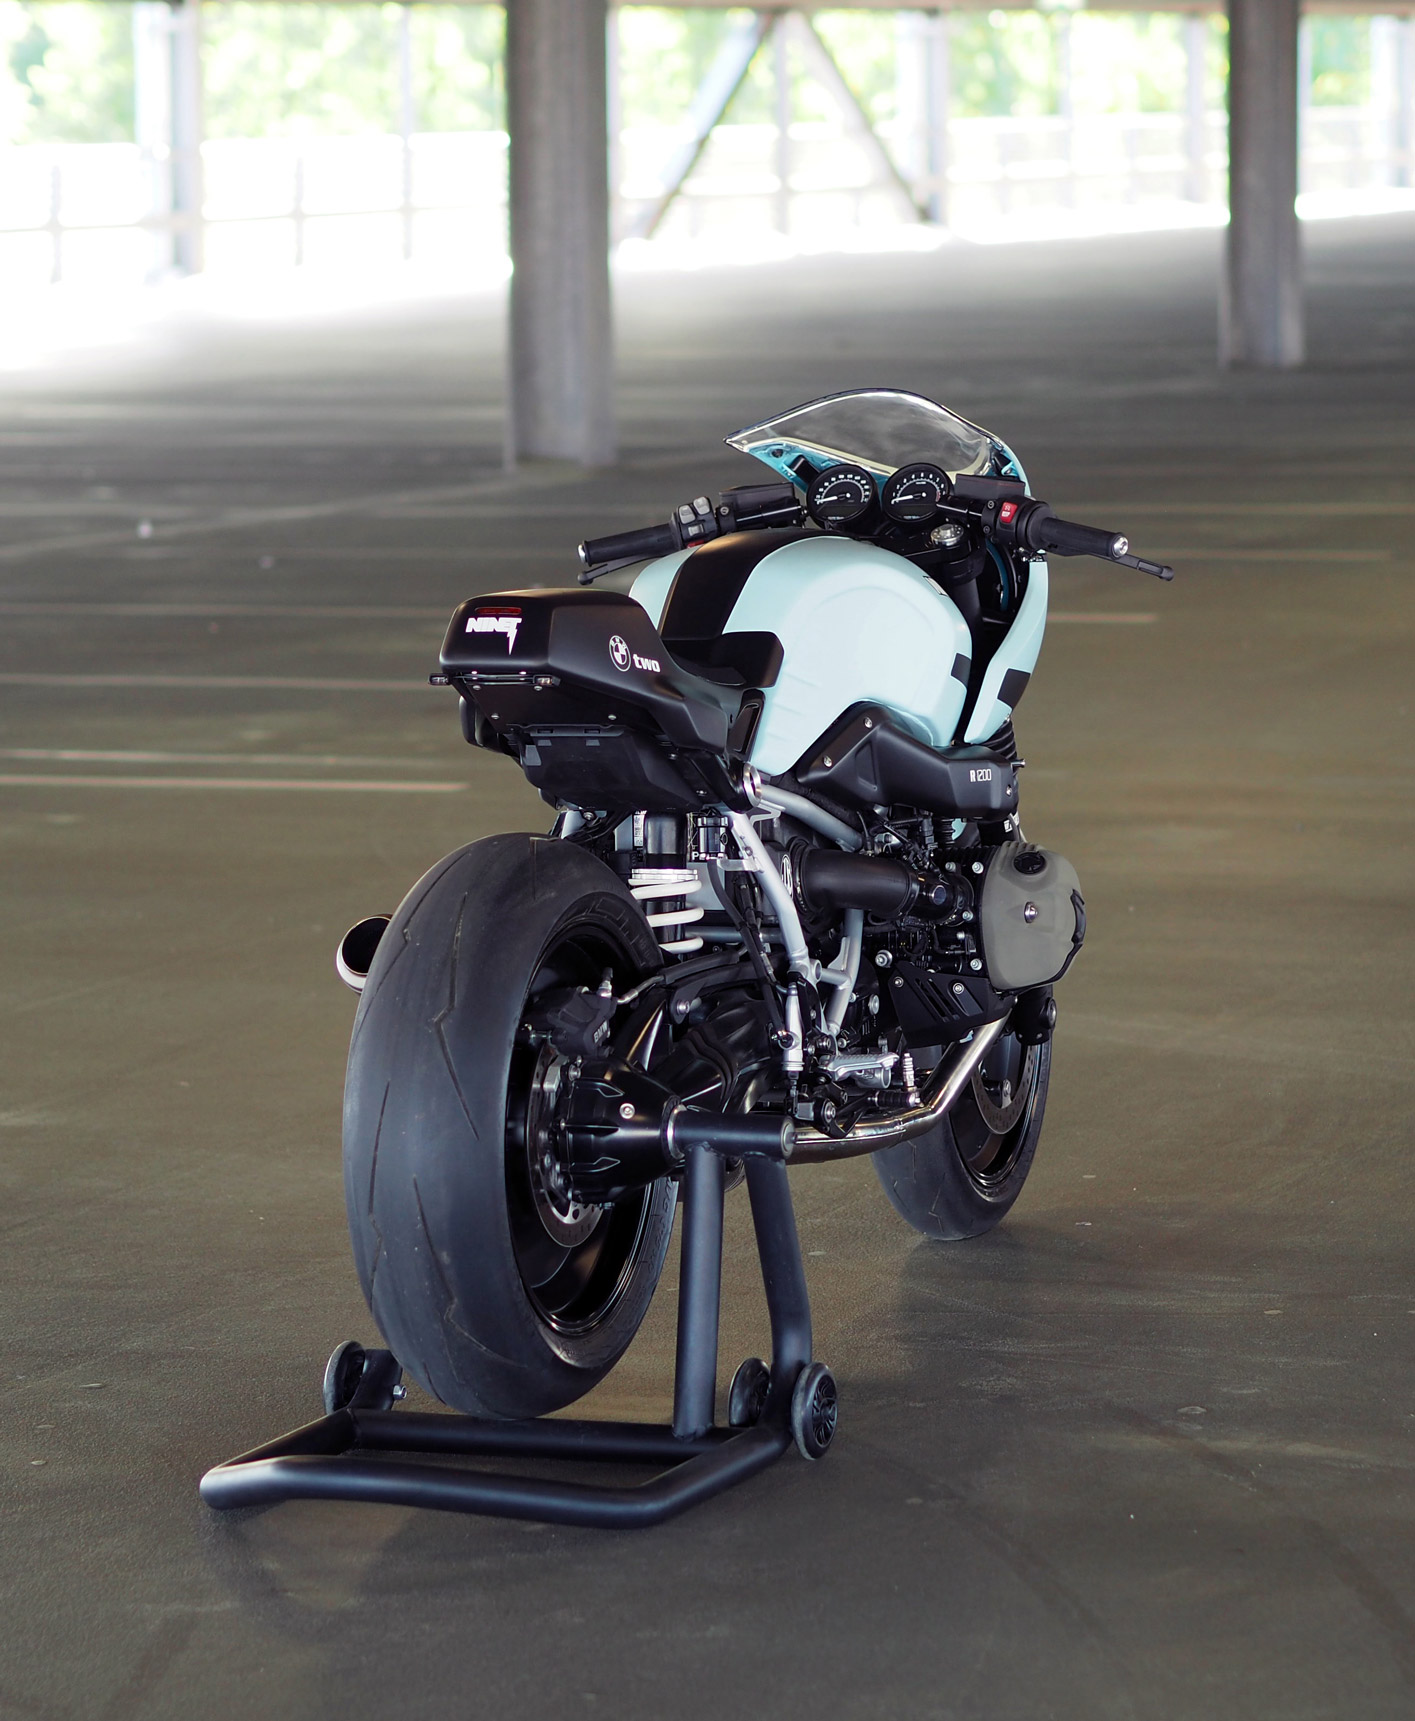 BMW RnineT Racer by JVB Moto